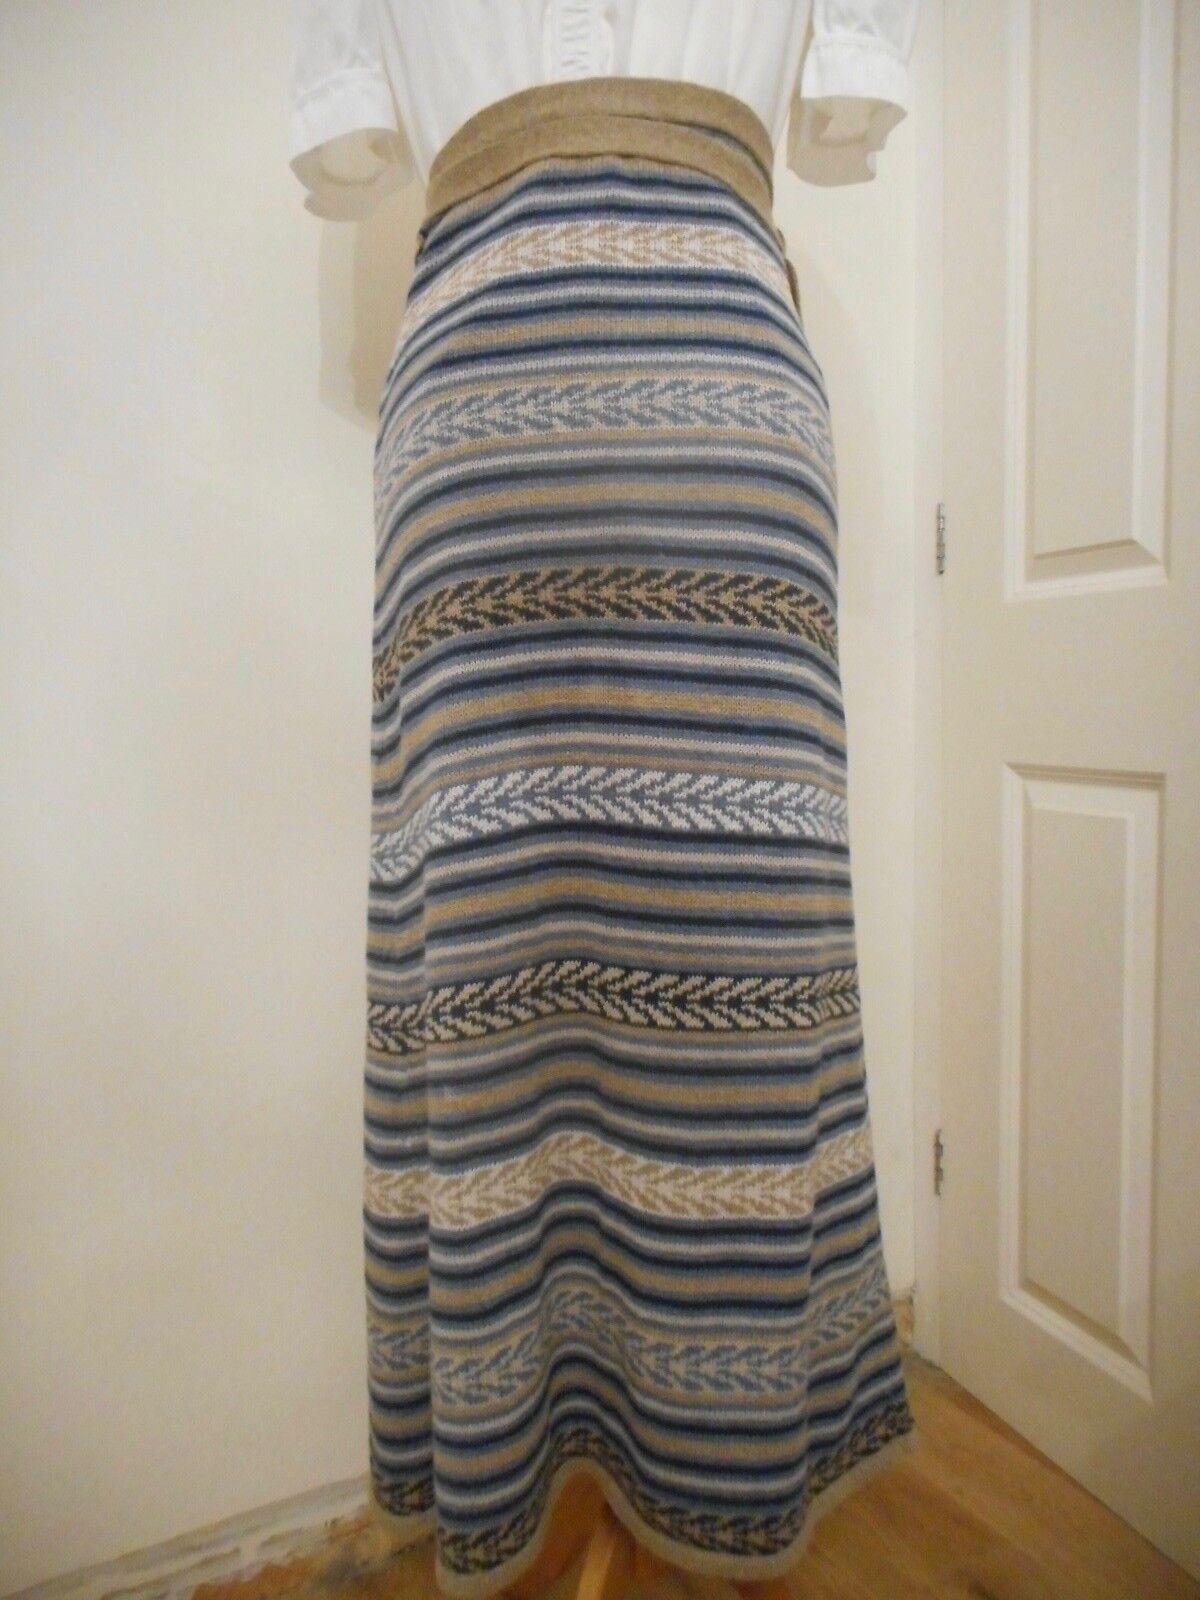 Nicole Farhi Net A Porter bluee Brown Stripe Linen Cotton Wrap Skirt UK Small